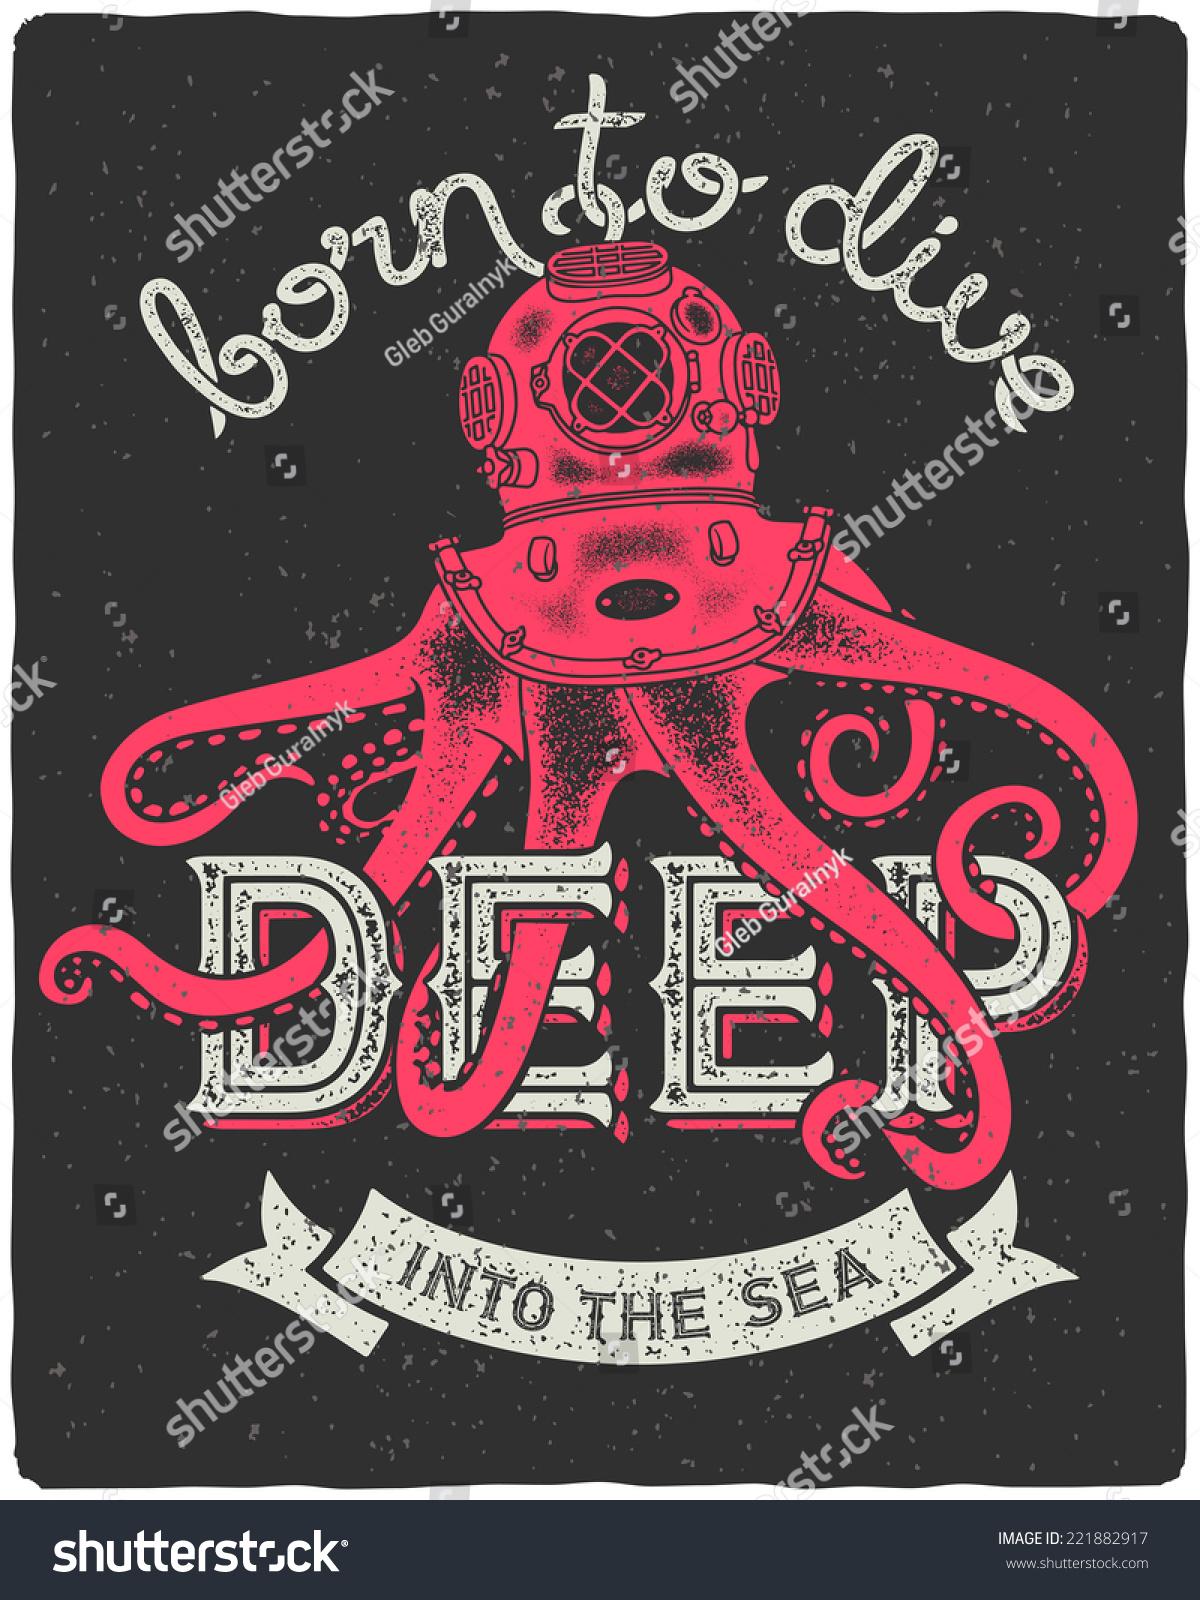 Shirt design octopus - Octopus Wearing A Diving Helmet Vintage Print For T Shirt With Slogan Born